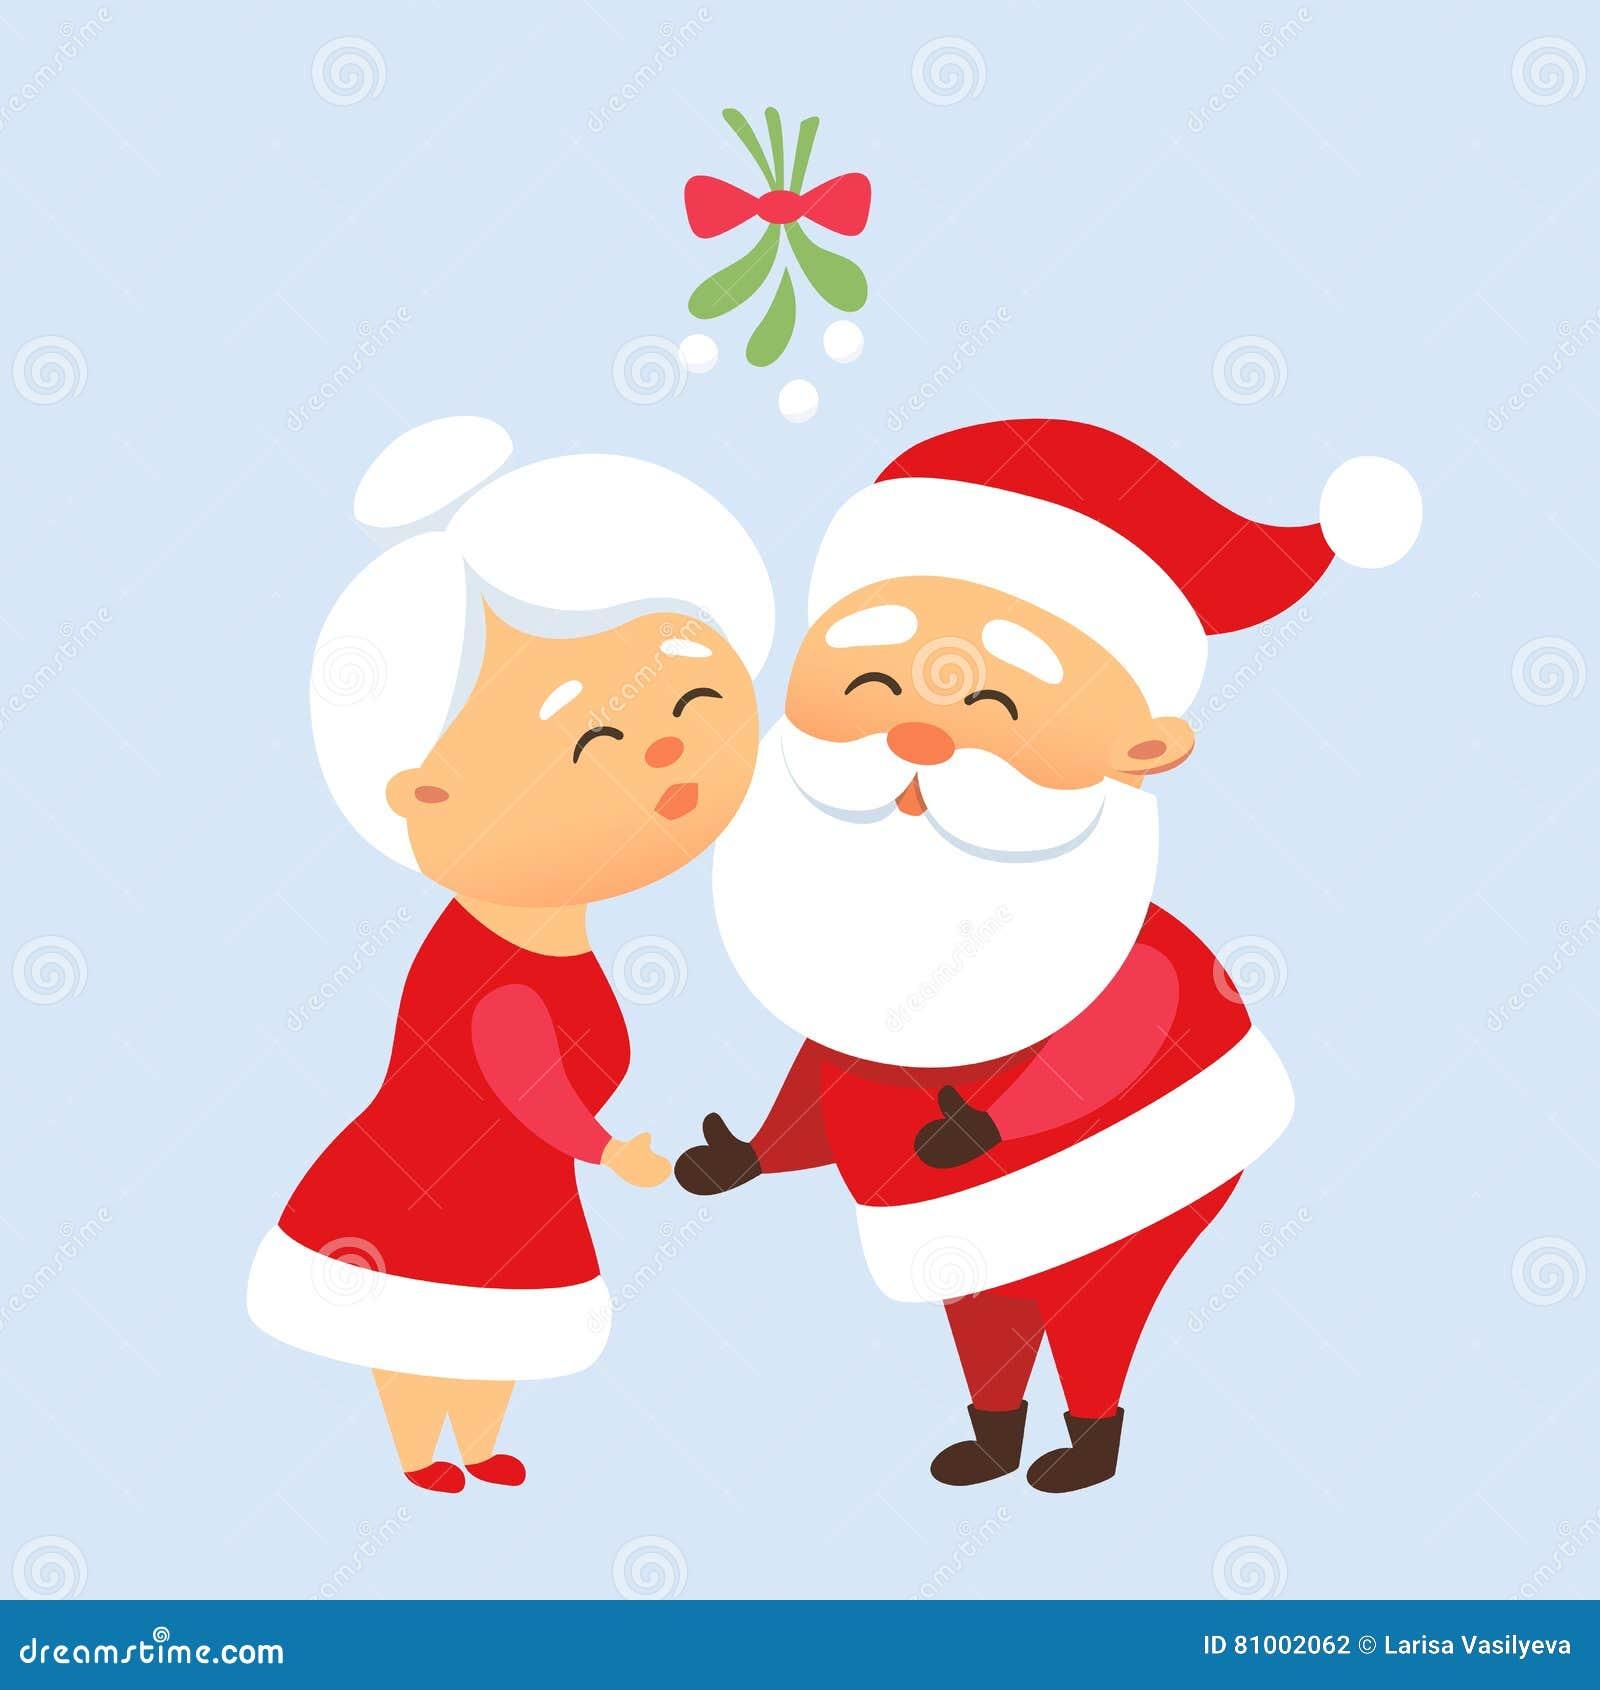 Santa Kiss His Wife Stock Vector. Illustration Of Love